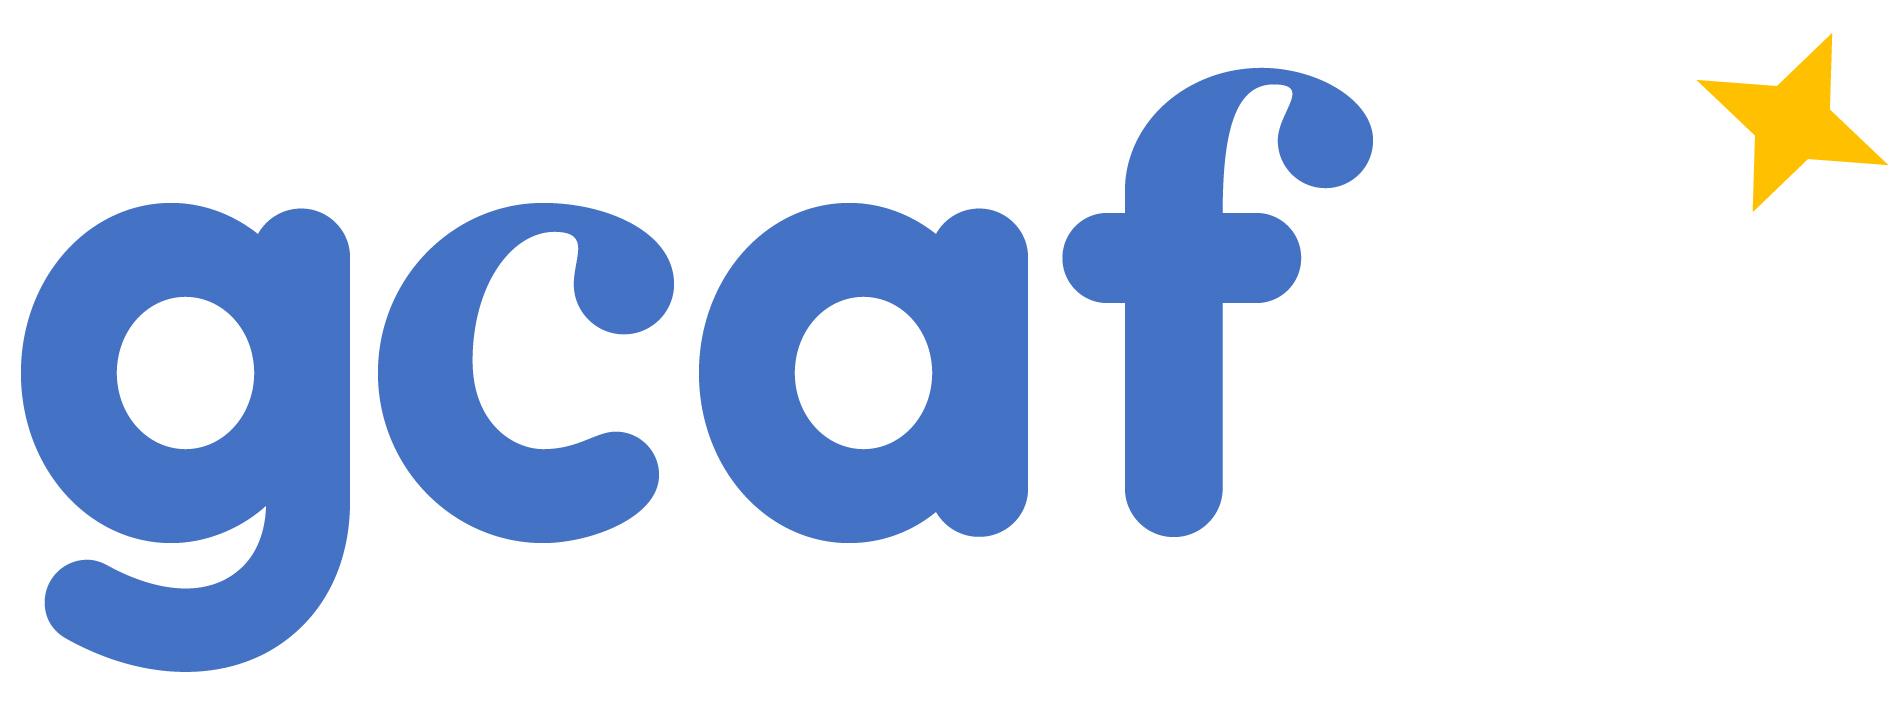 Les carnets de GCAF